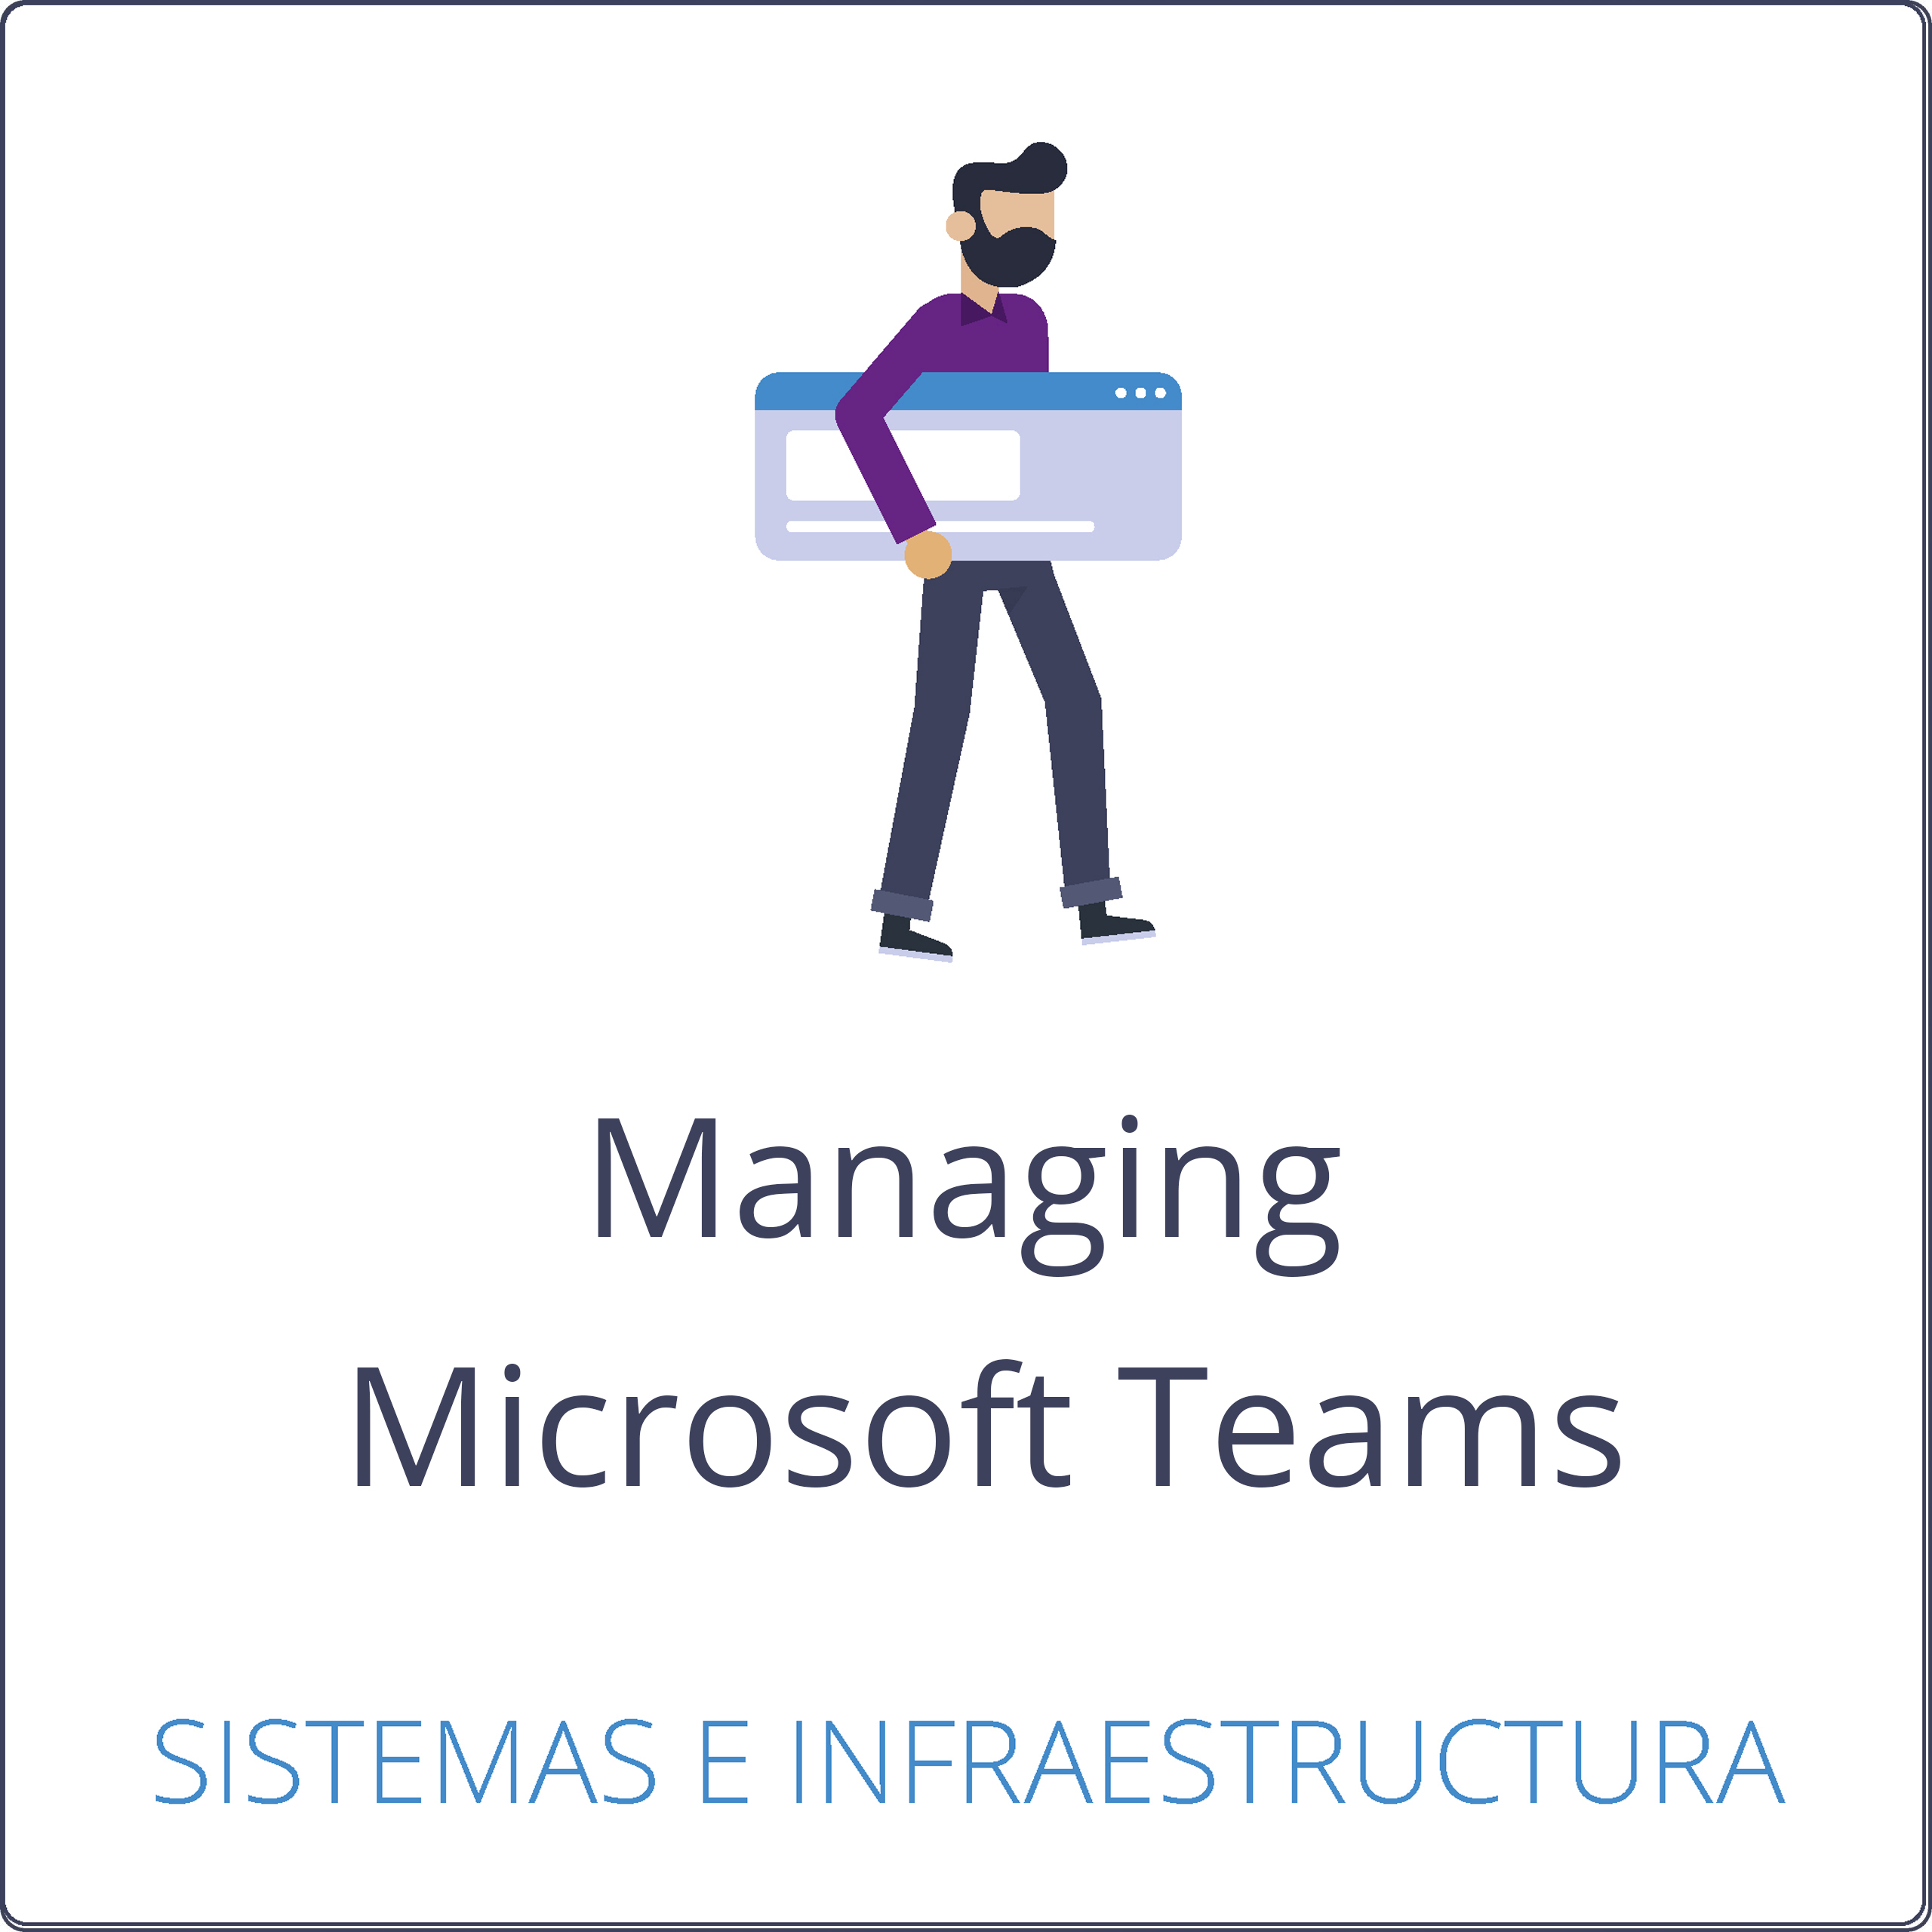 Managing Microsoft Teams